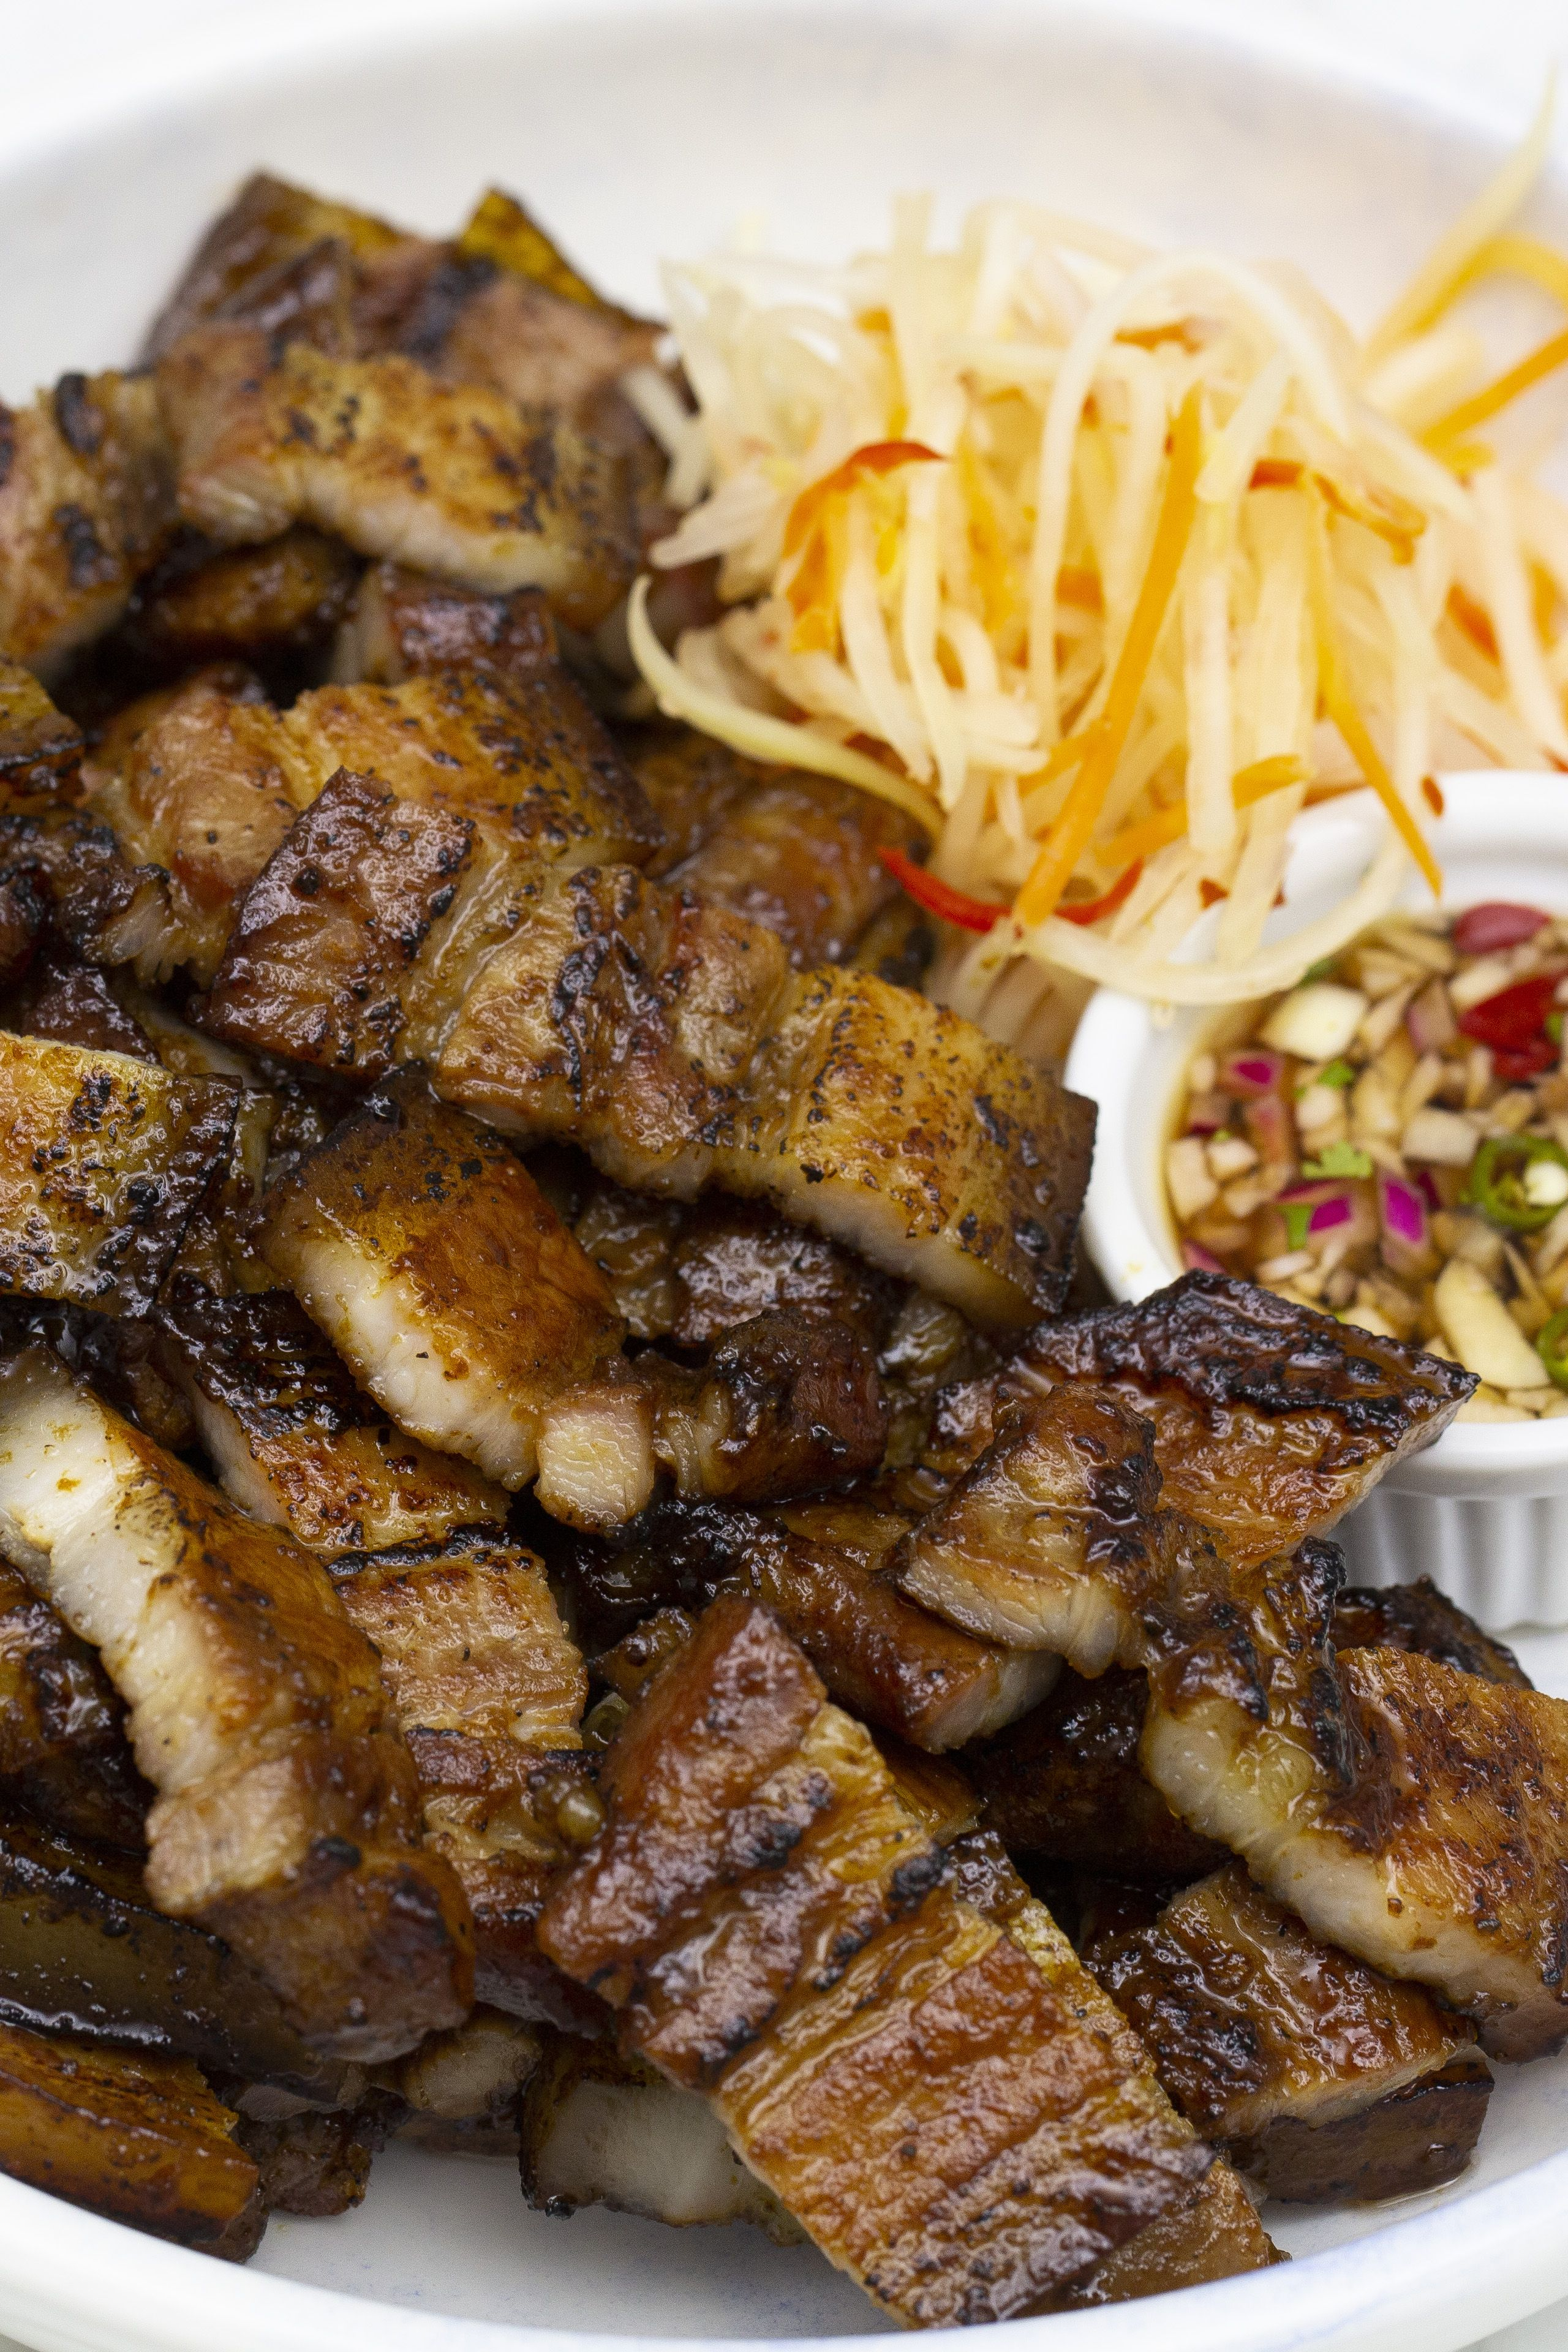 Recipe + Video | Kfc chicken recipe, Recipes, Pork belly